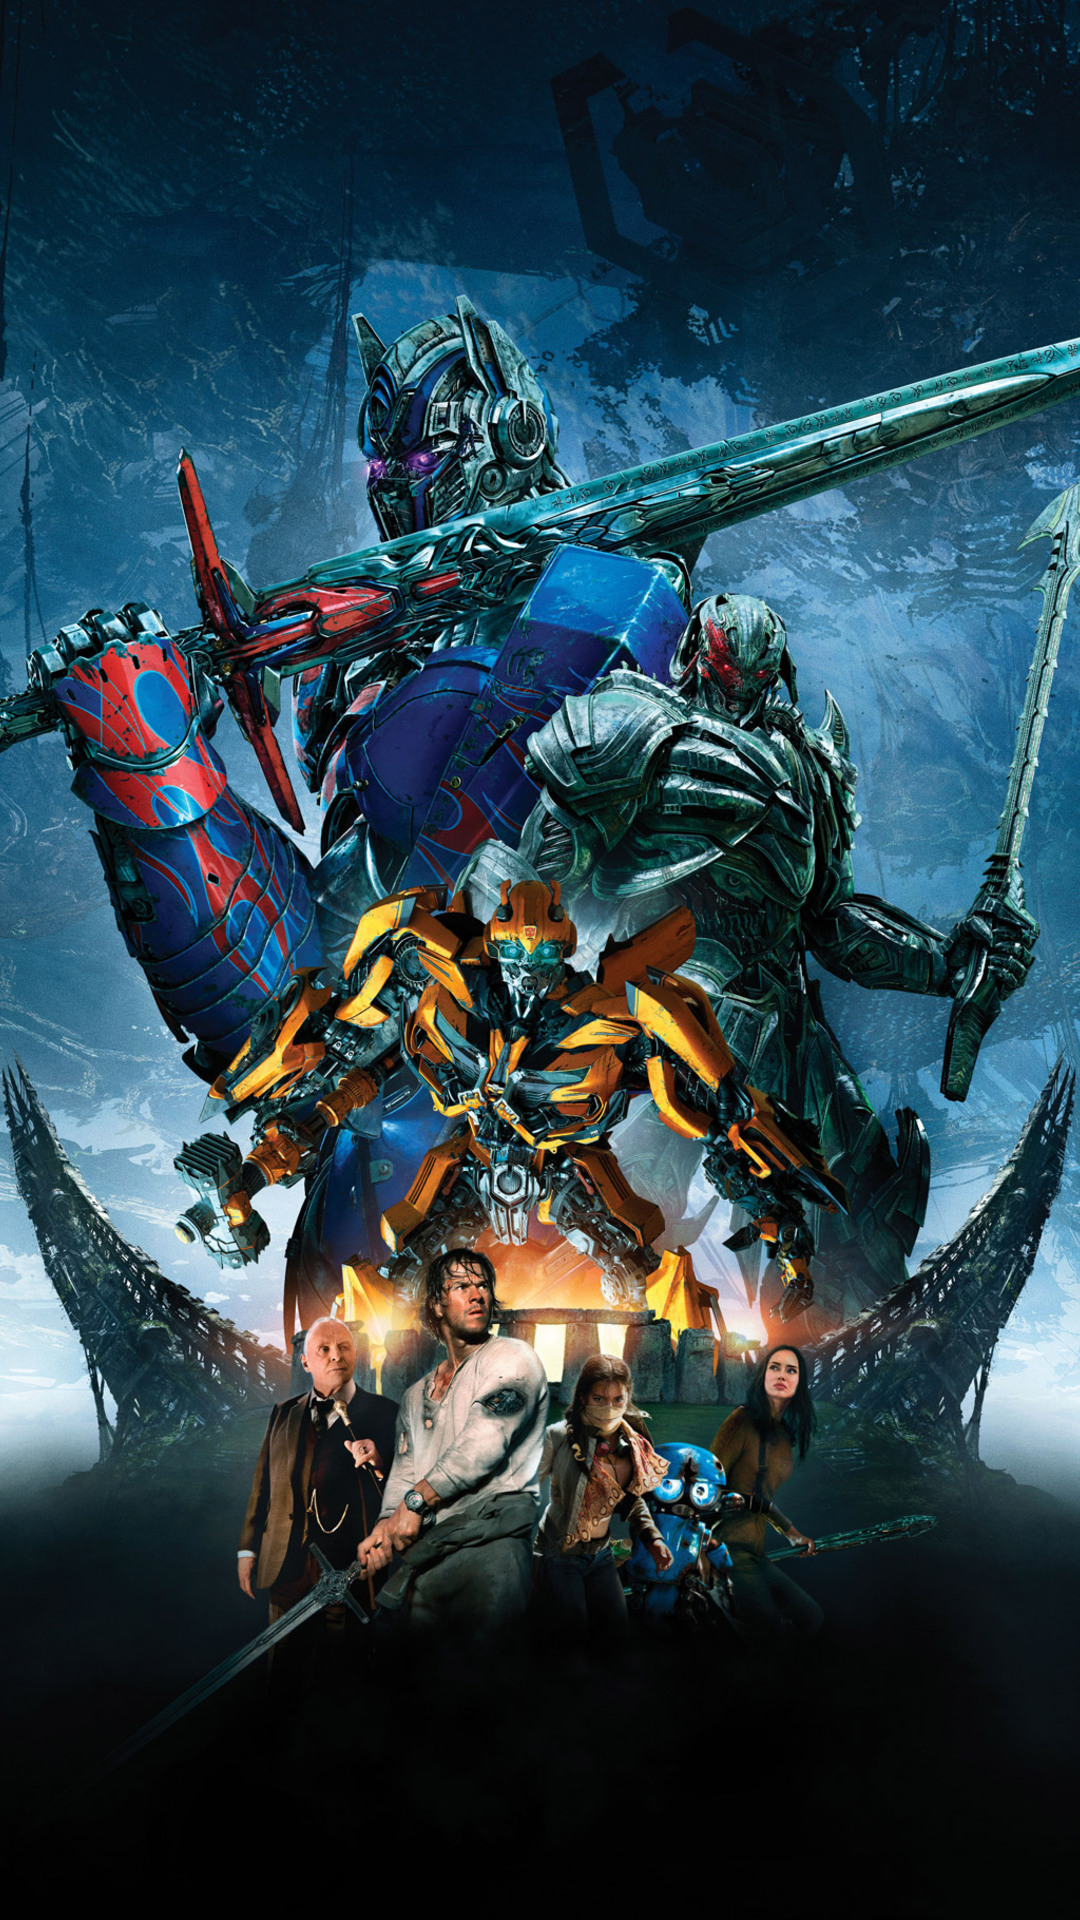 transformers-the-last-knight-bumblebee-megatron-optimus-prime-4k-5k-1k.jpg